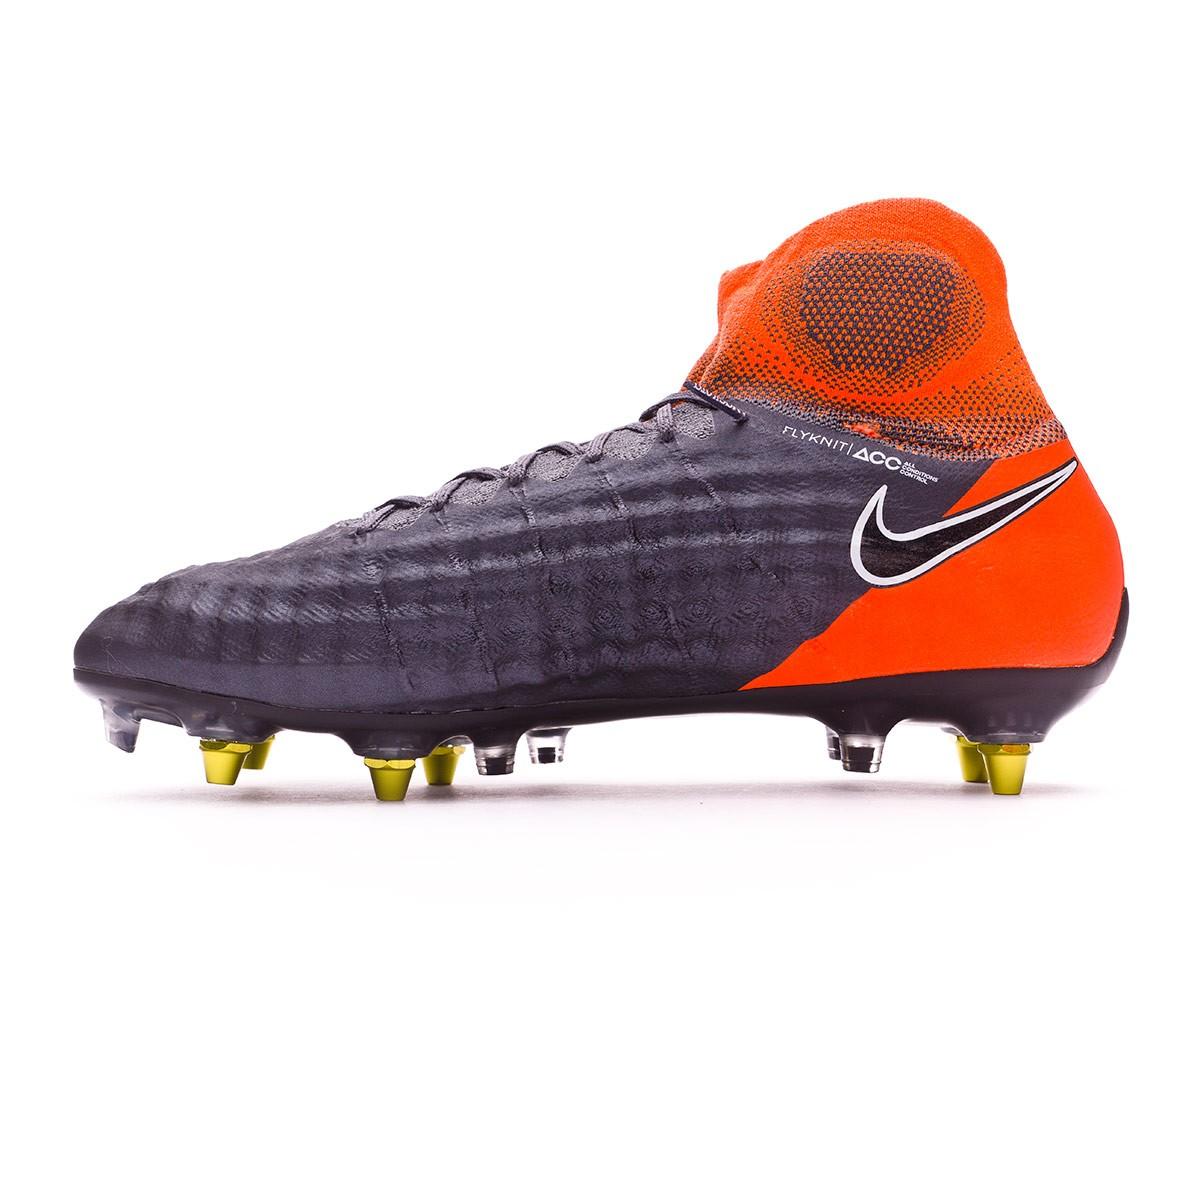 huge selection of 6be3c 401d4 Football Boots Nike Magista Obra II Elite SG-Pro Anti-Clog Dark grey-Black-Total  orange-White - Tienda de fútbol Fútbol Emotion